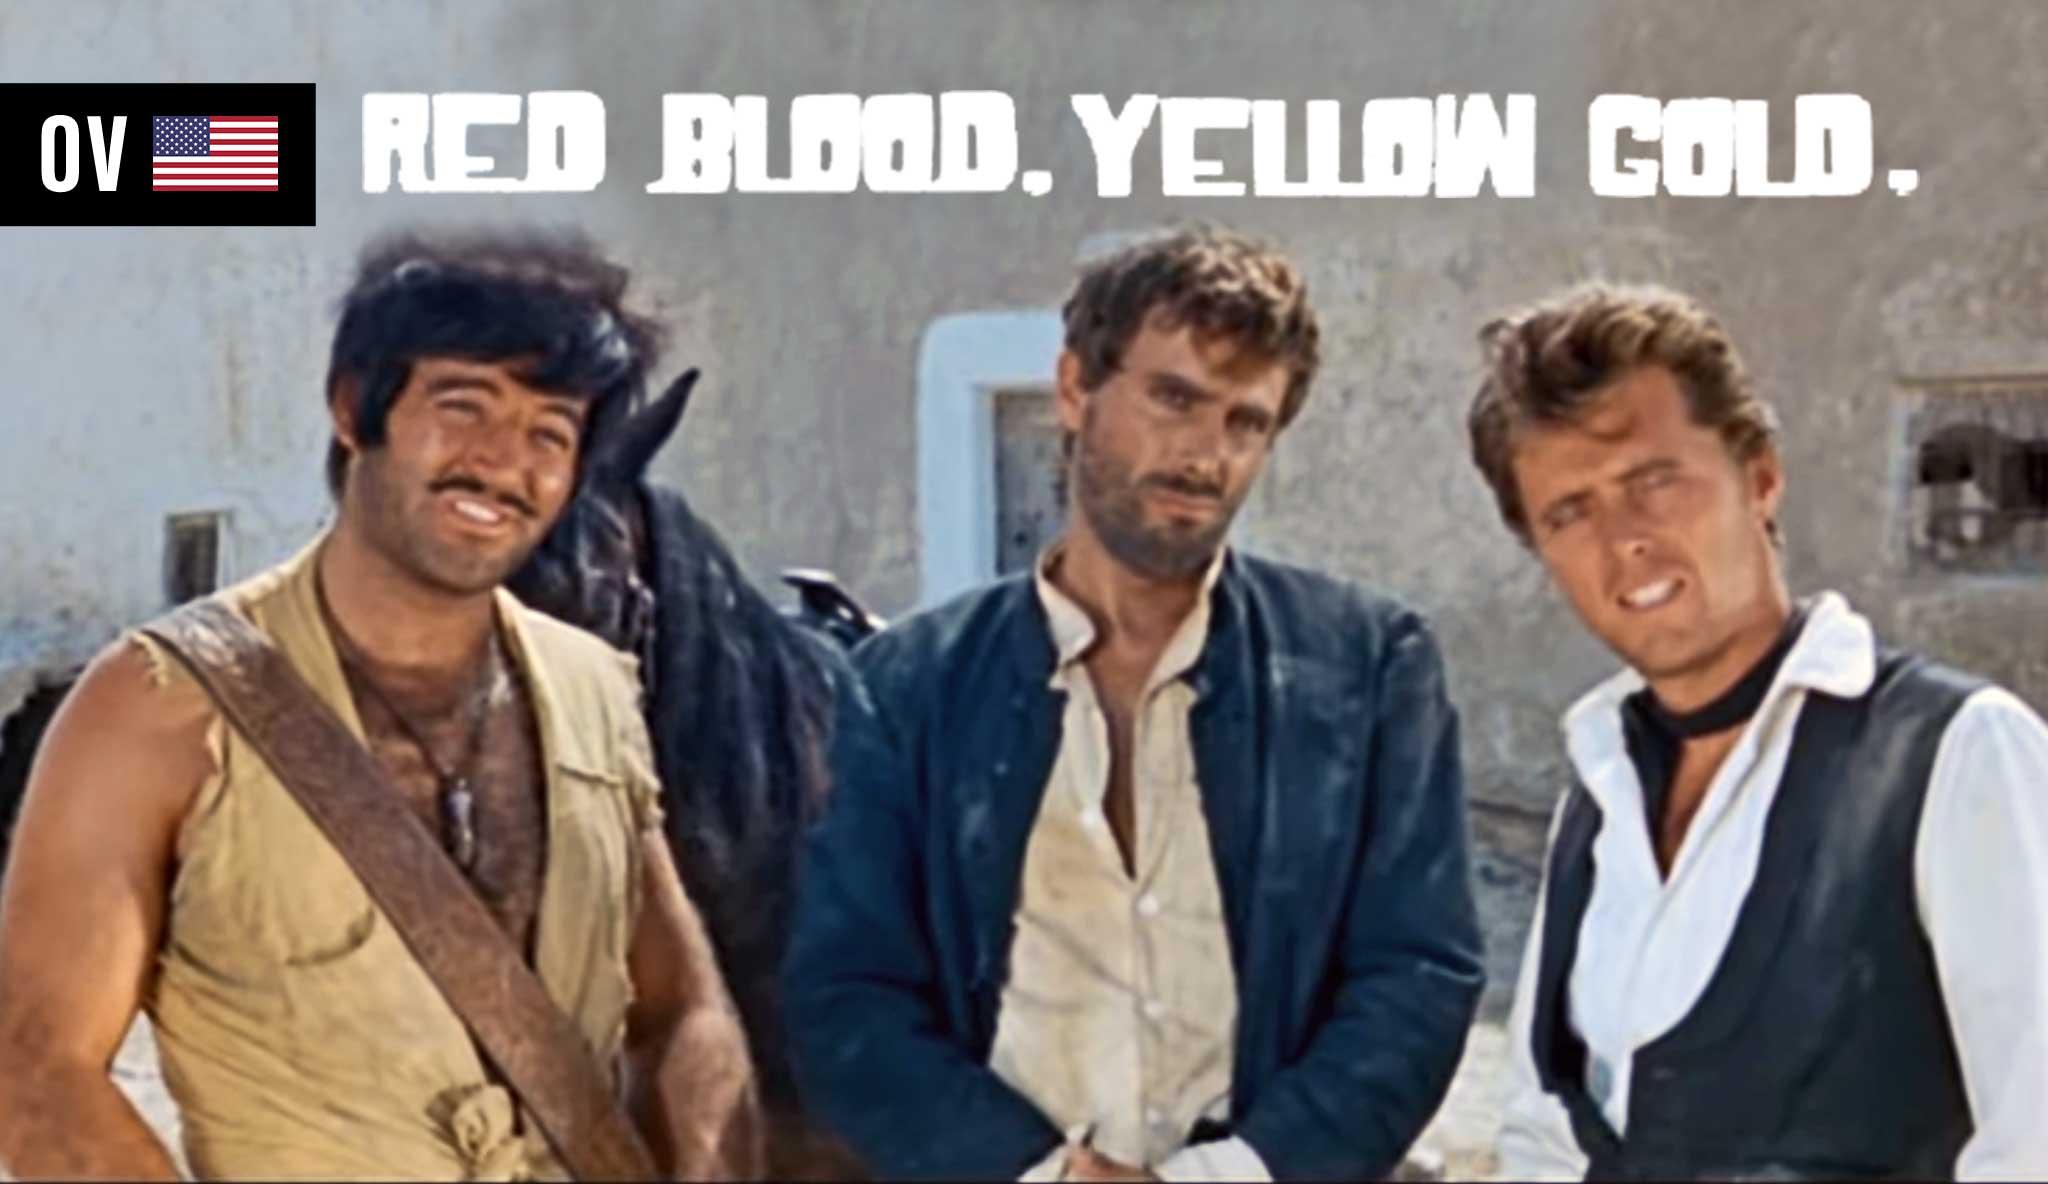 red-blood-yellow-gold\header.jpg